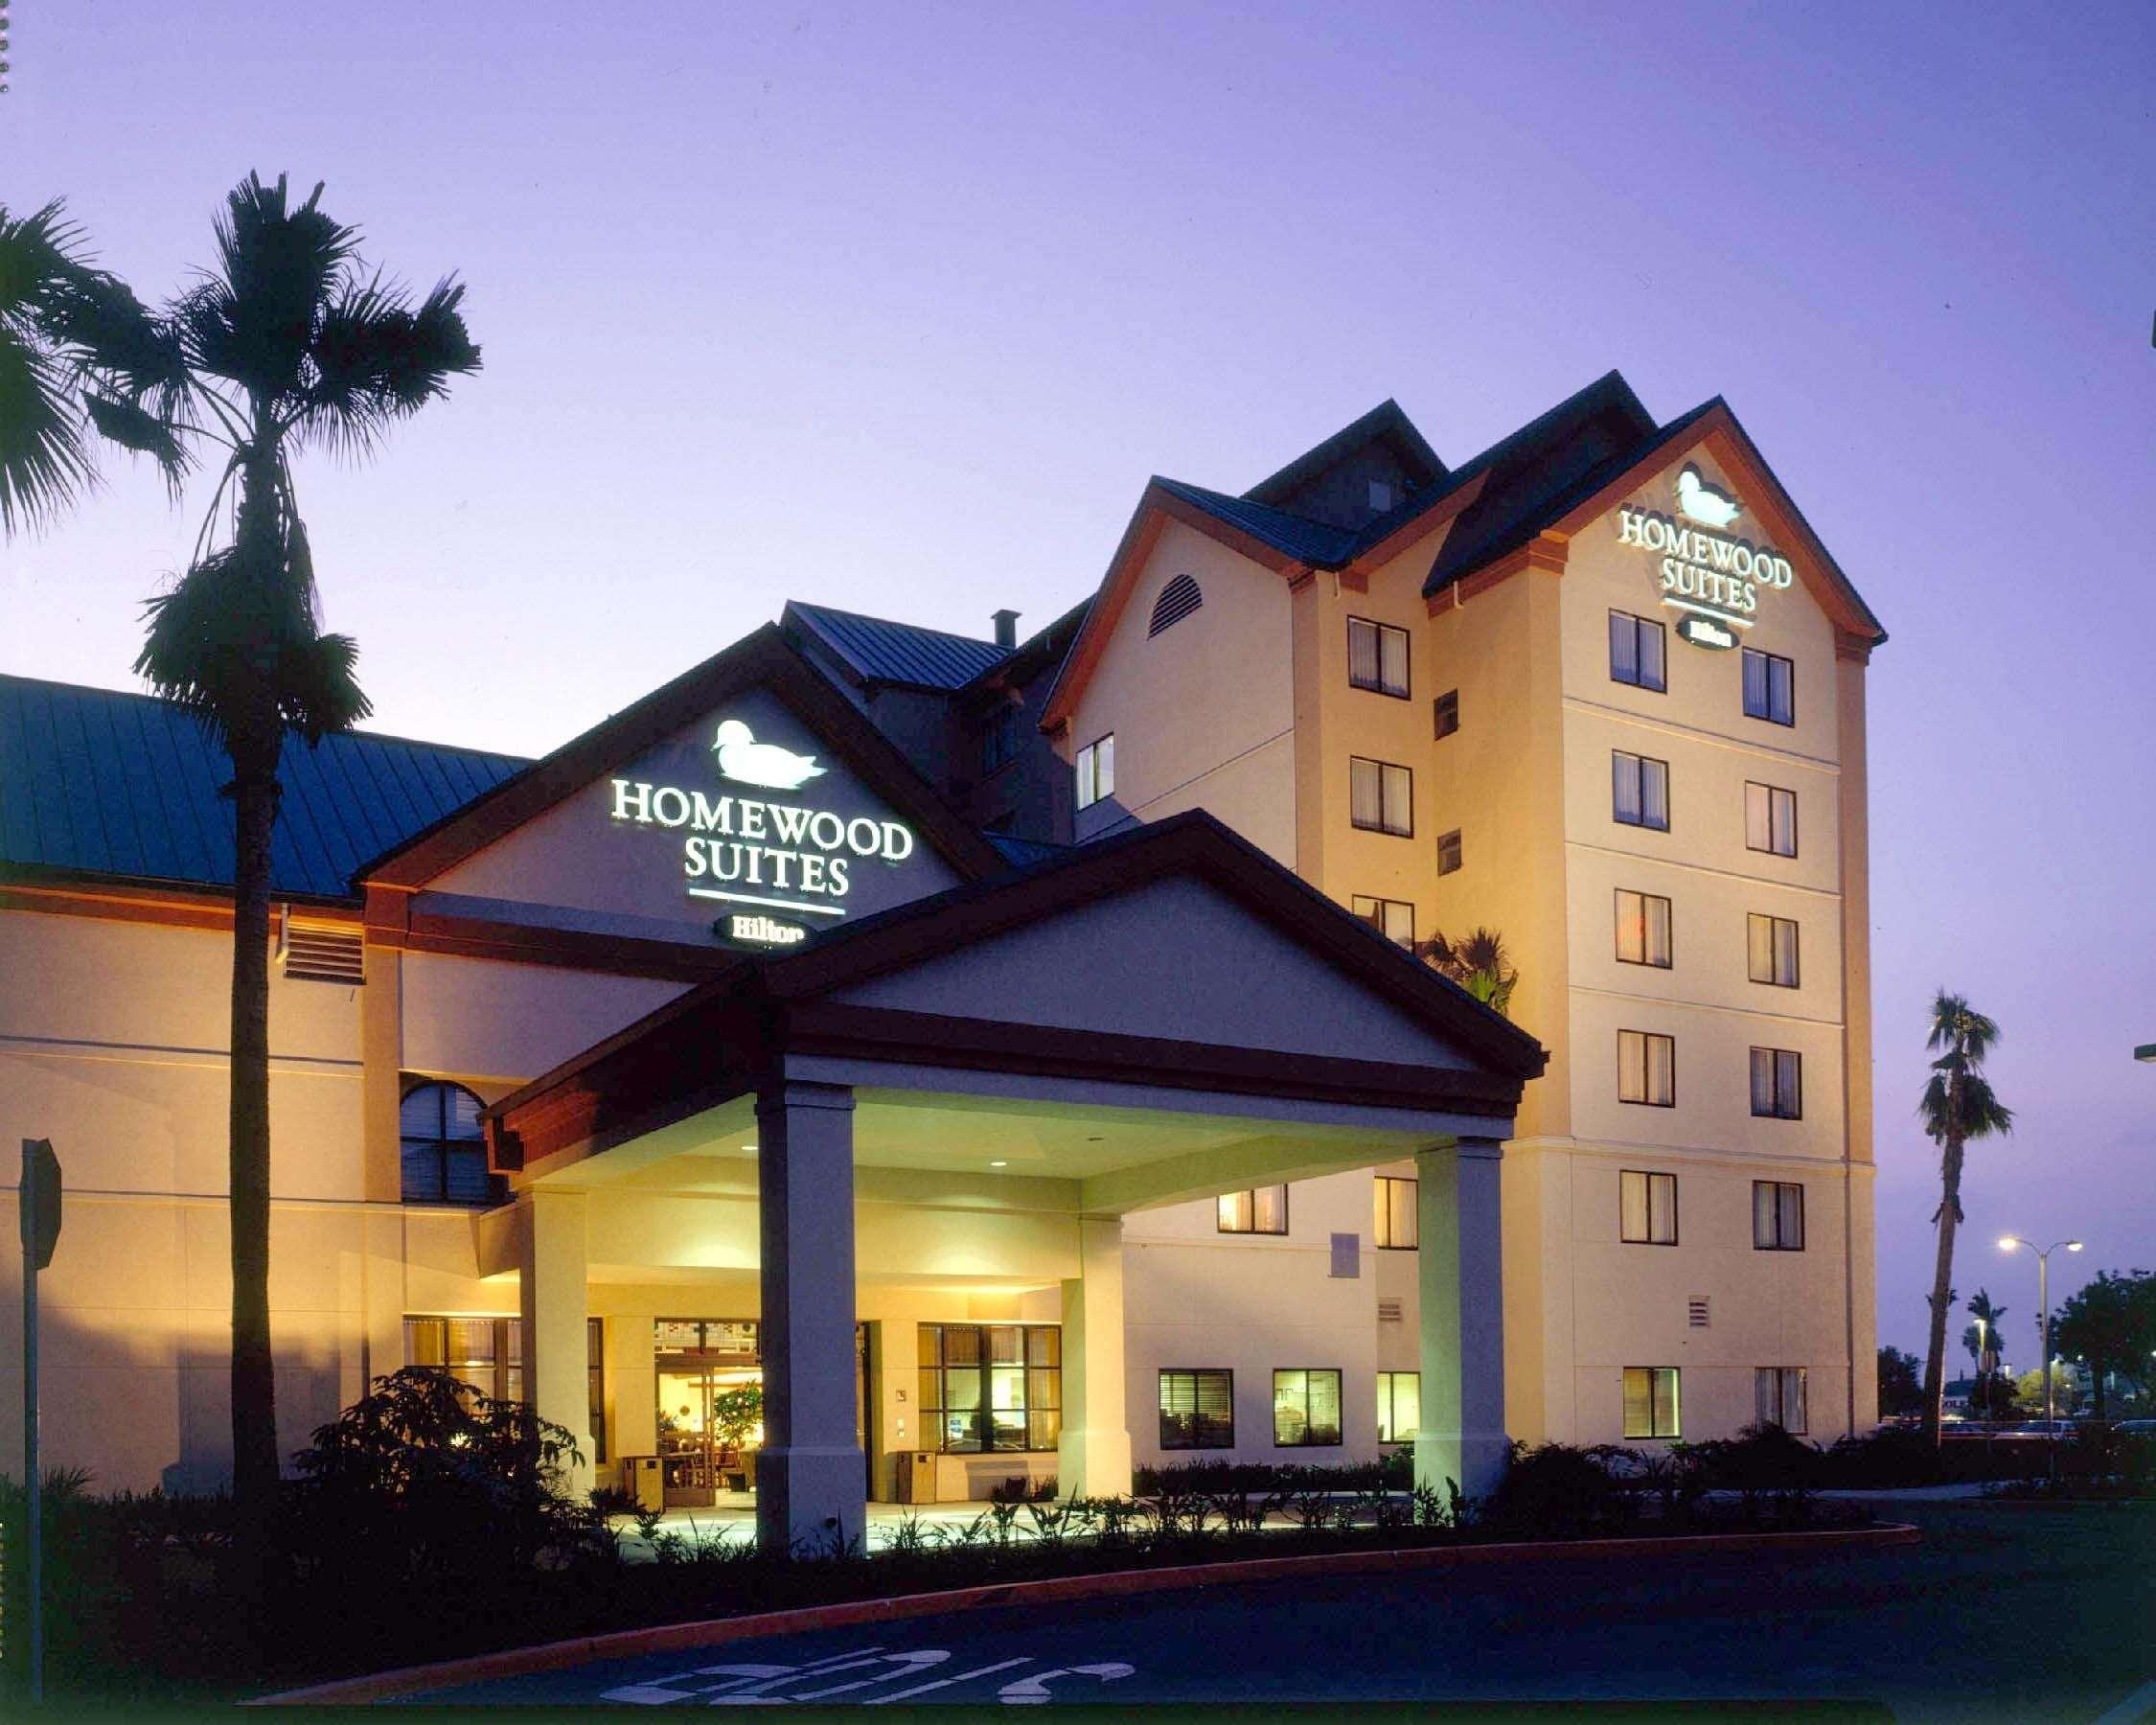 Homewood Suites by Hilton Anaheim-Main Gate Area image 3